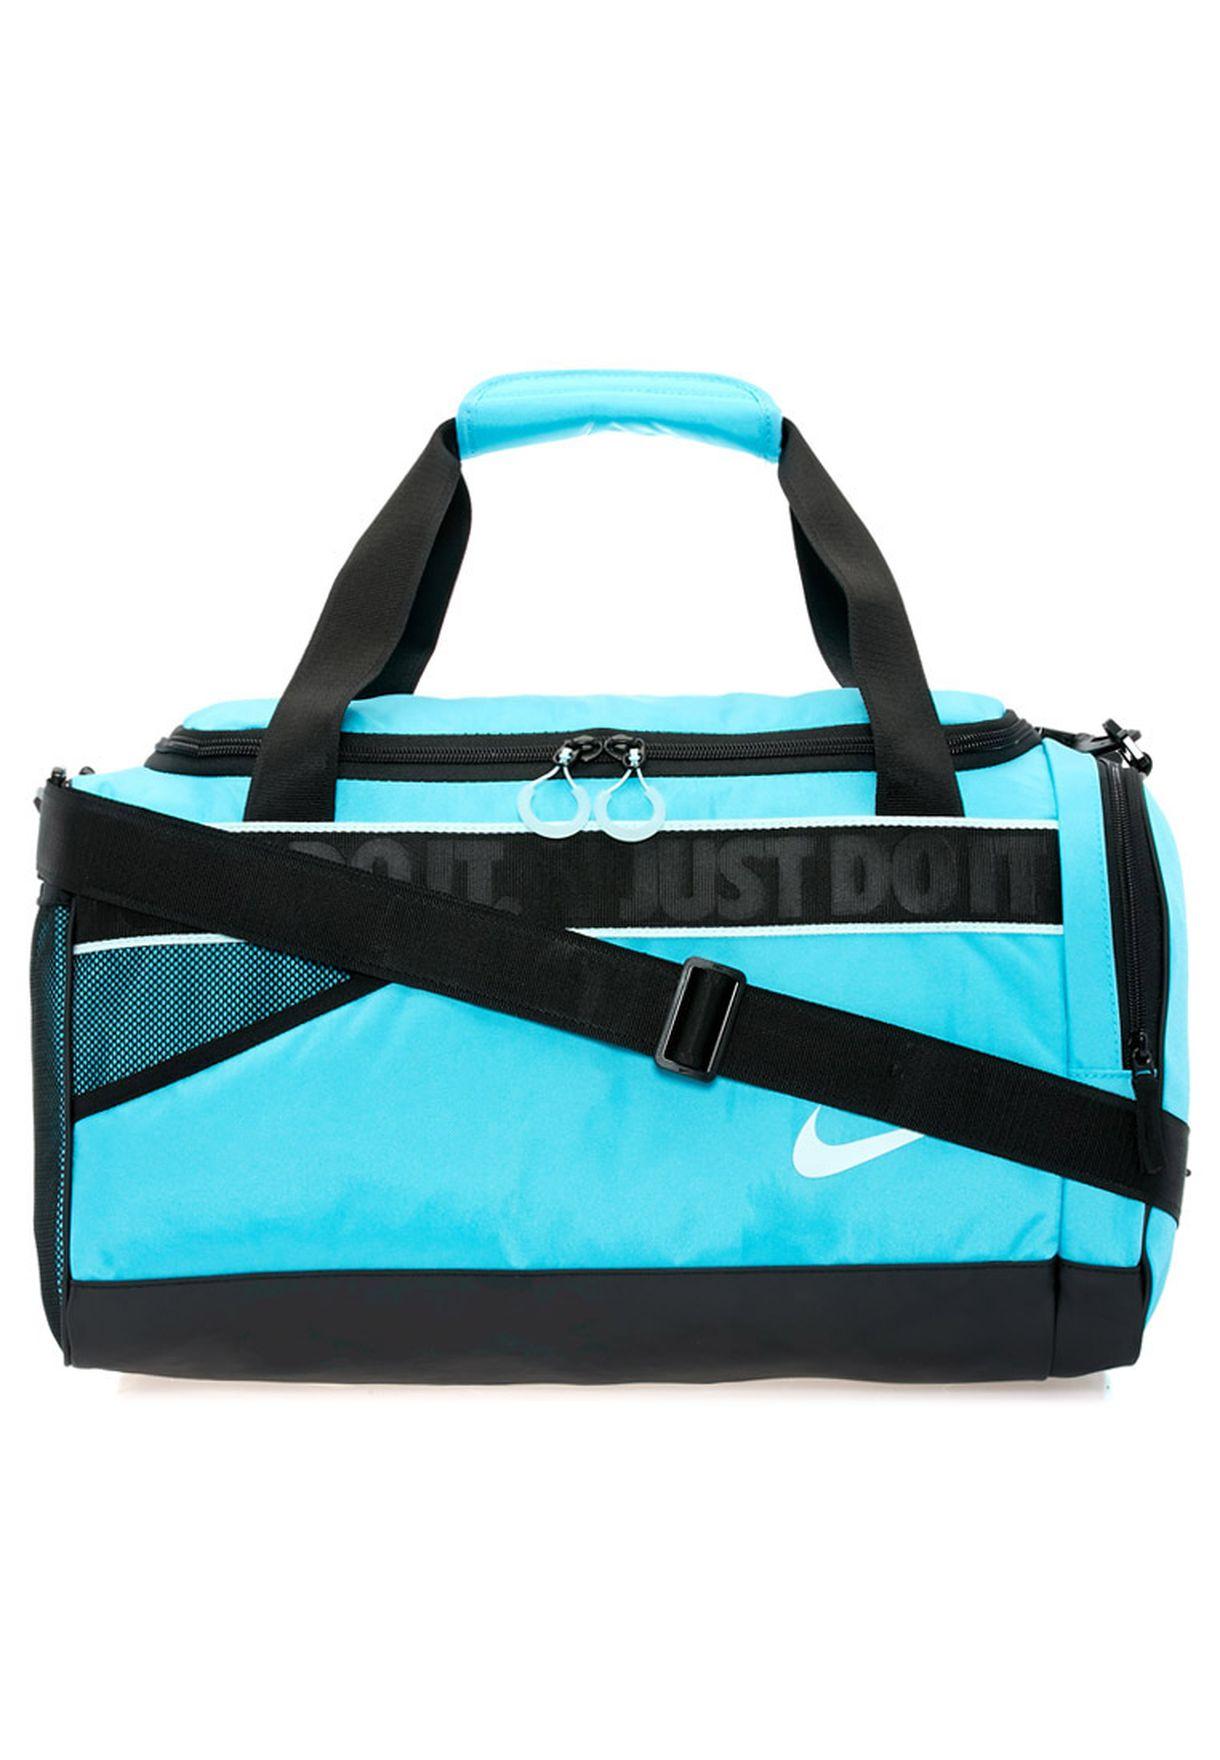 80beea0d02f Shop Nike blue Medium Varsity Duffel Bag NEQP-BA4732-413 for Women ...